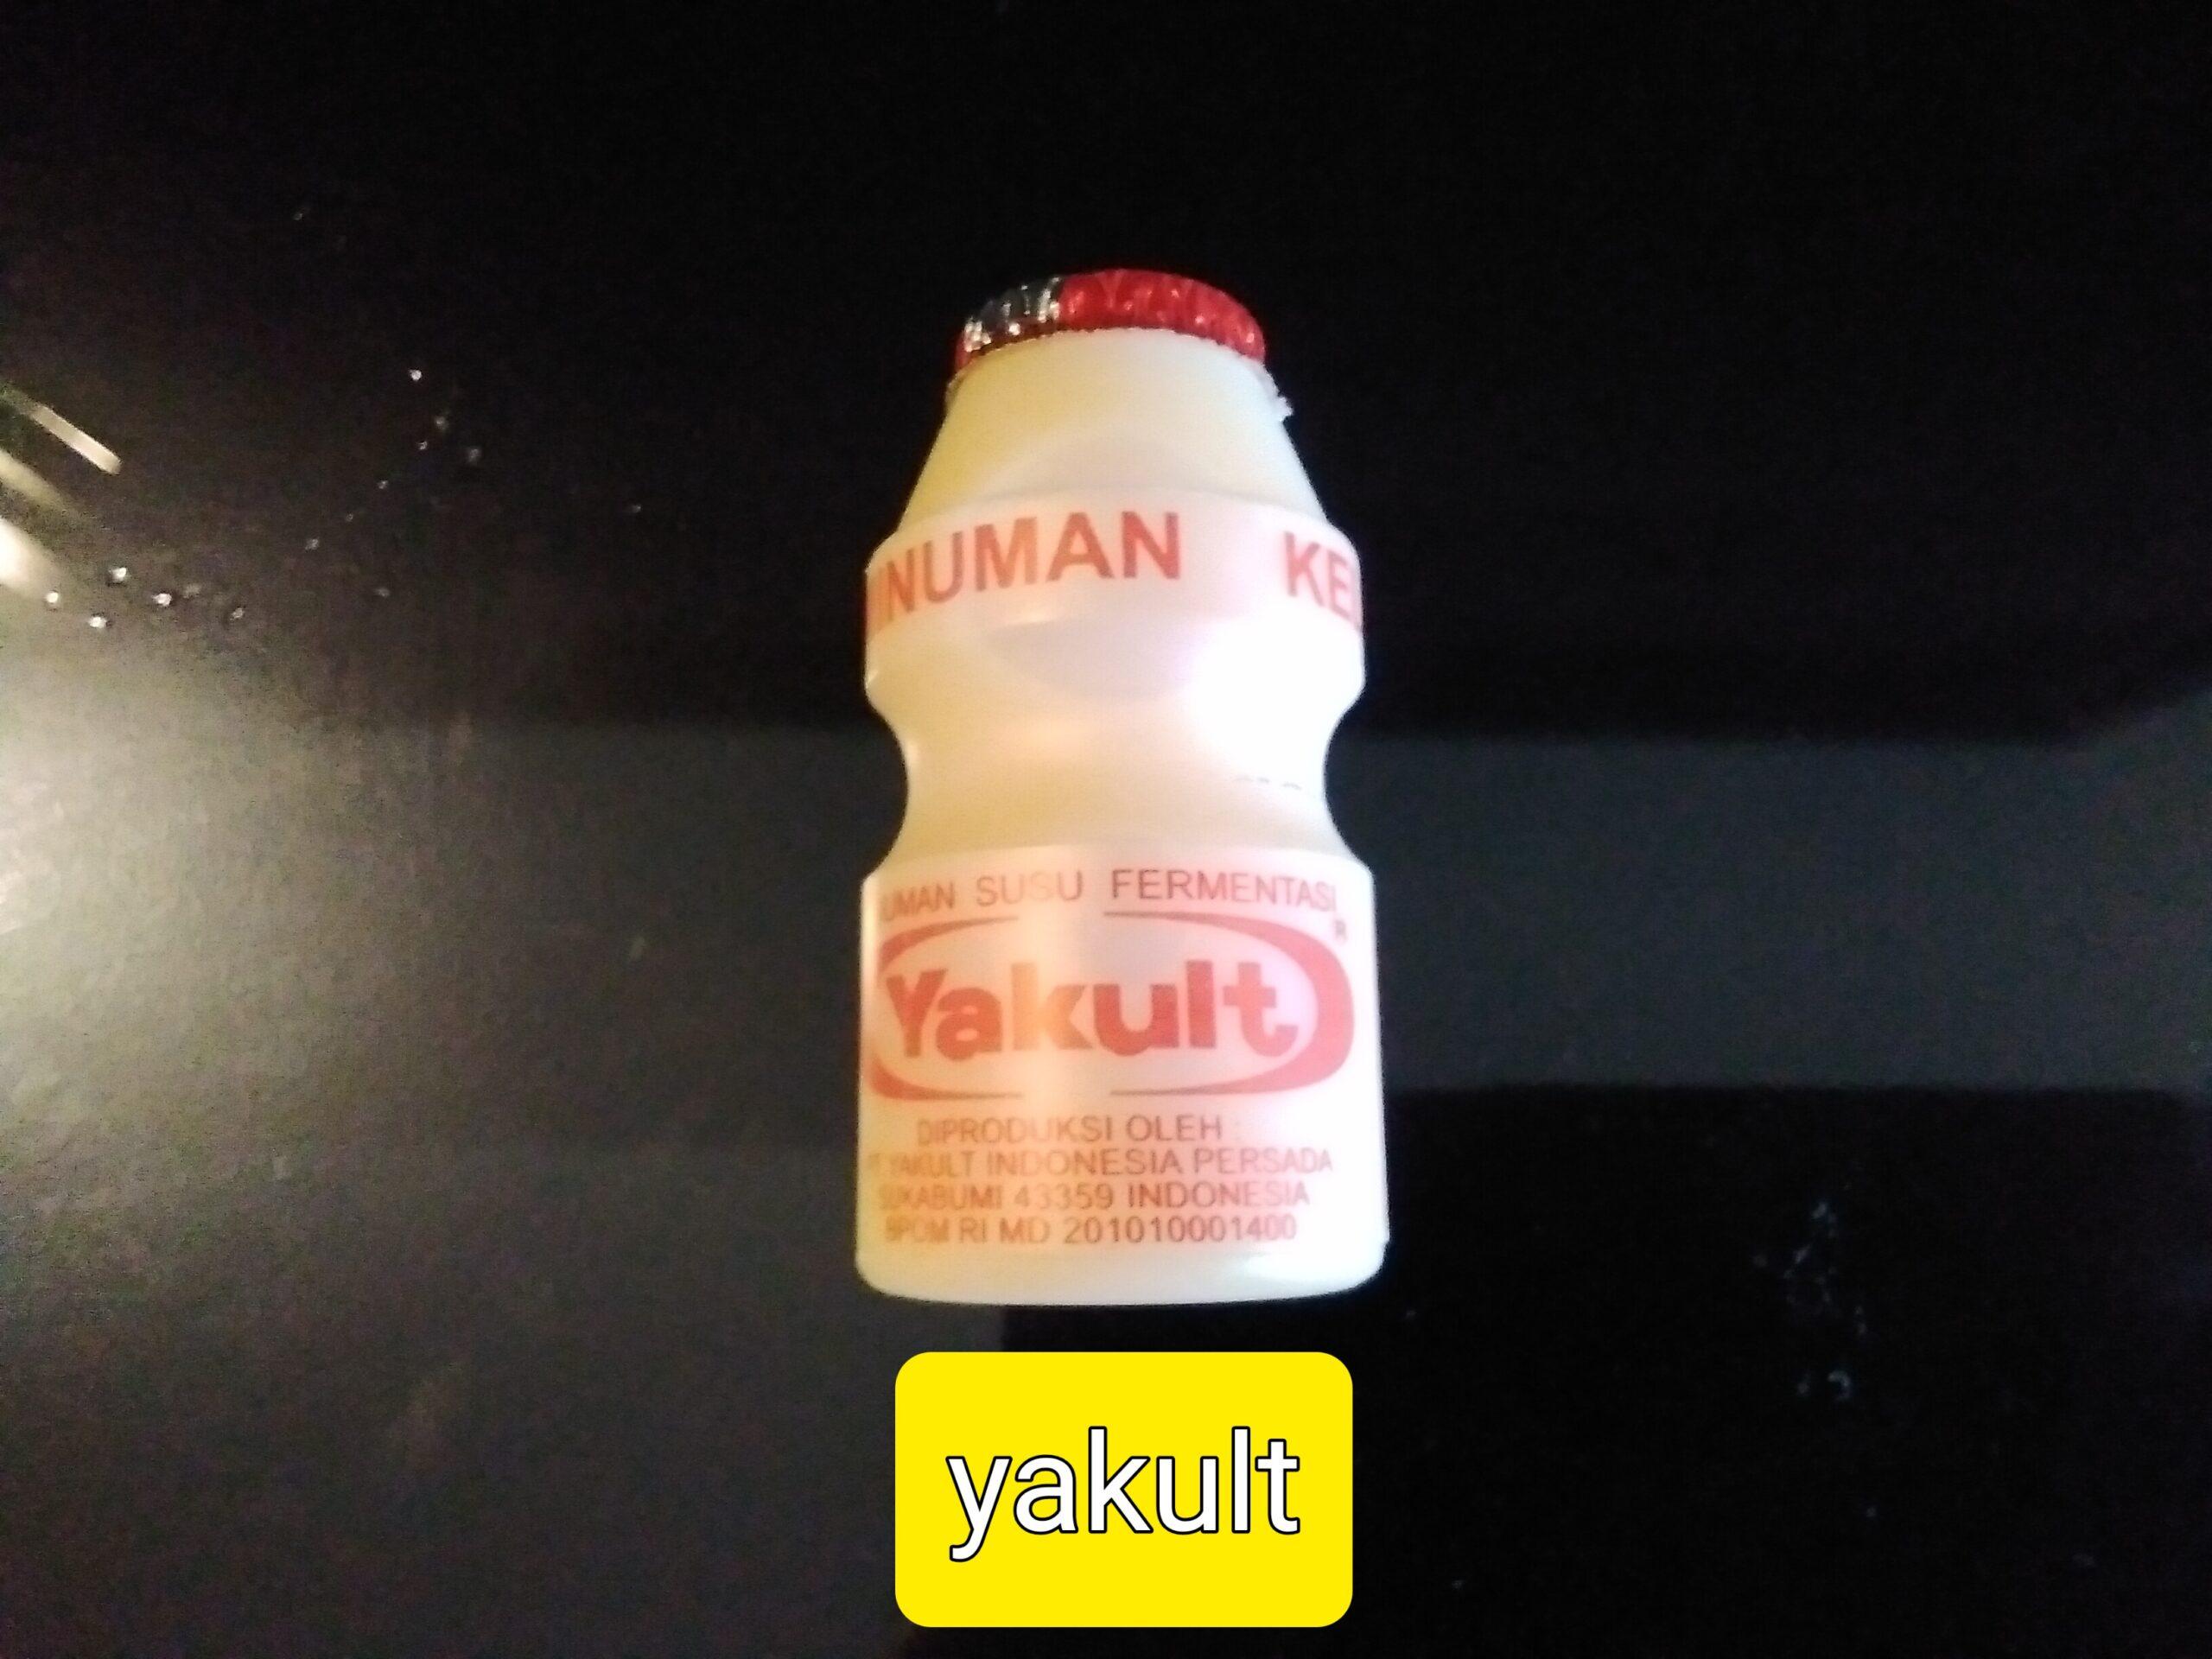 yogurt drink or yakult